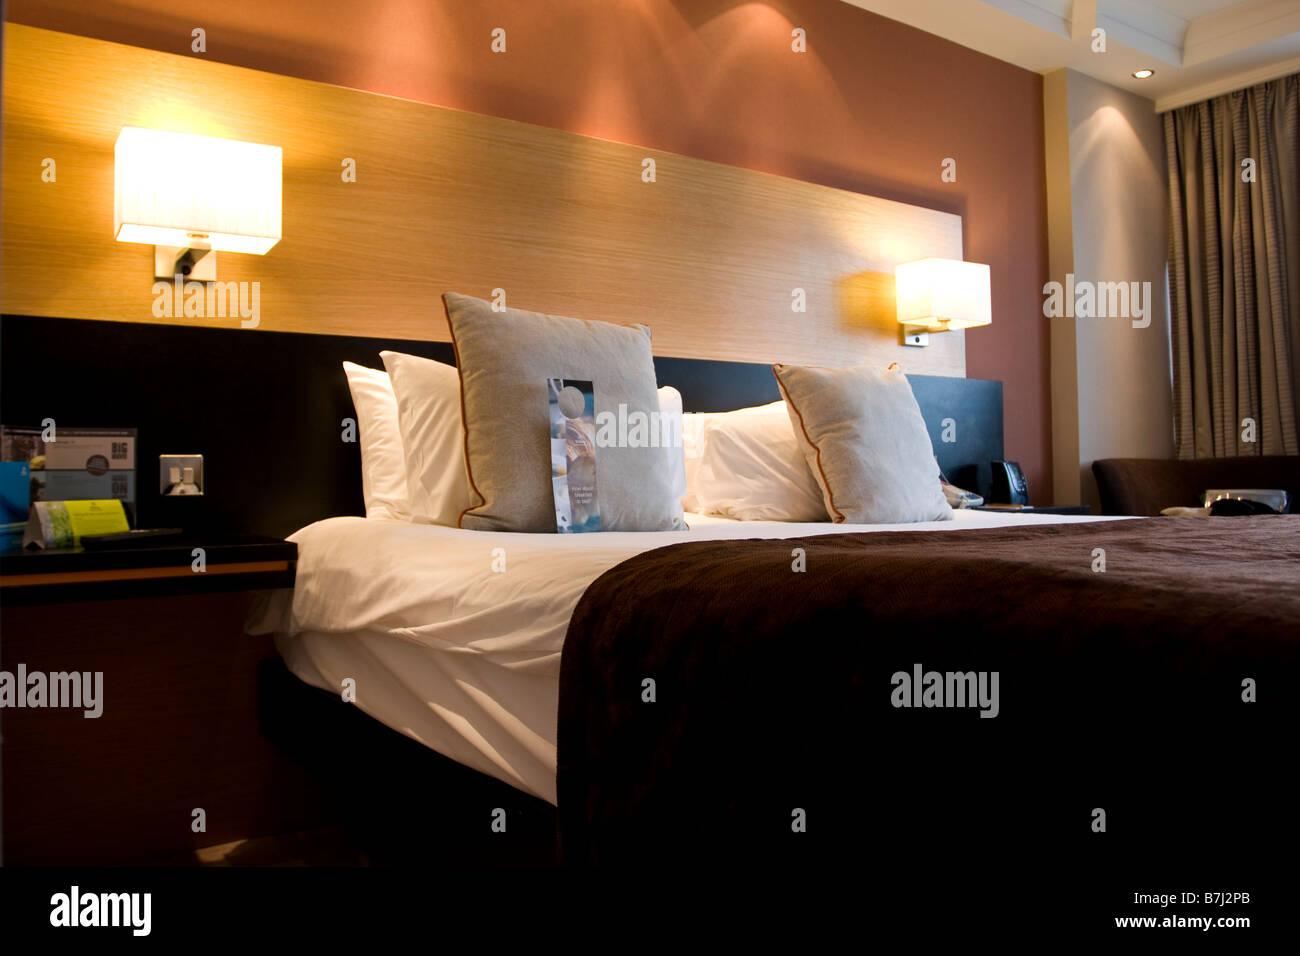 Hilton Hotel Metropole Stockbild